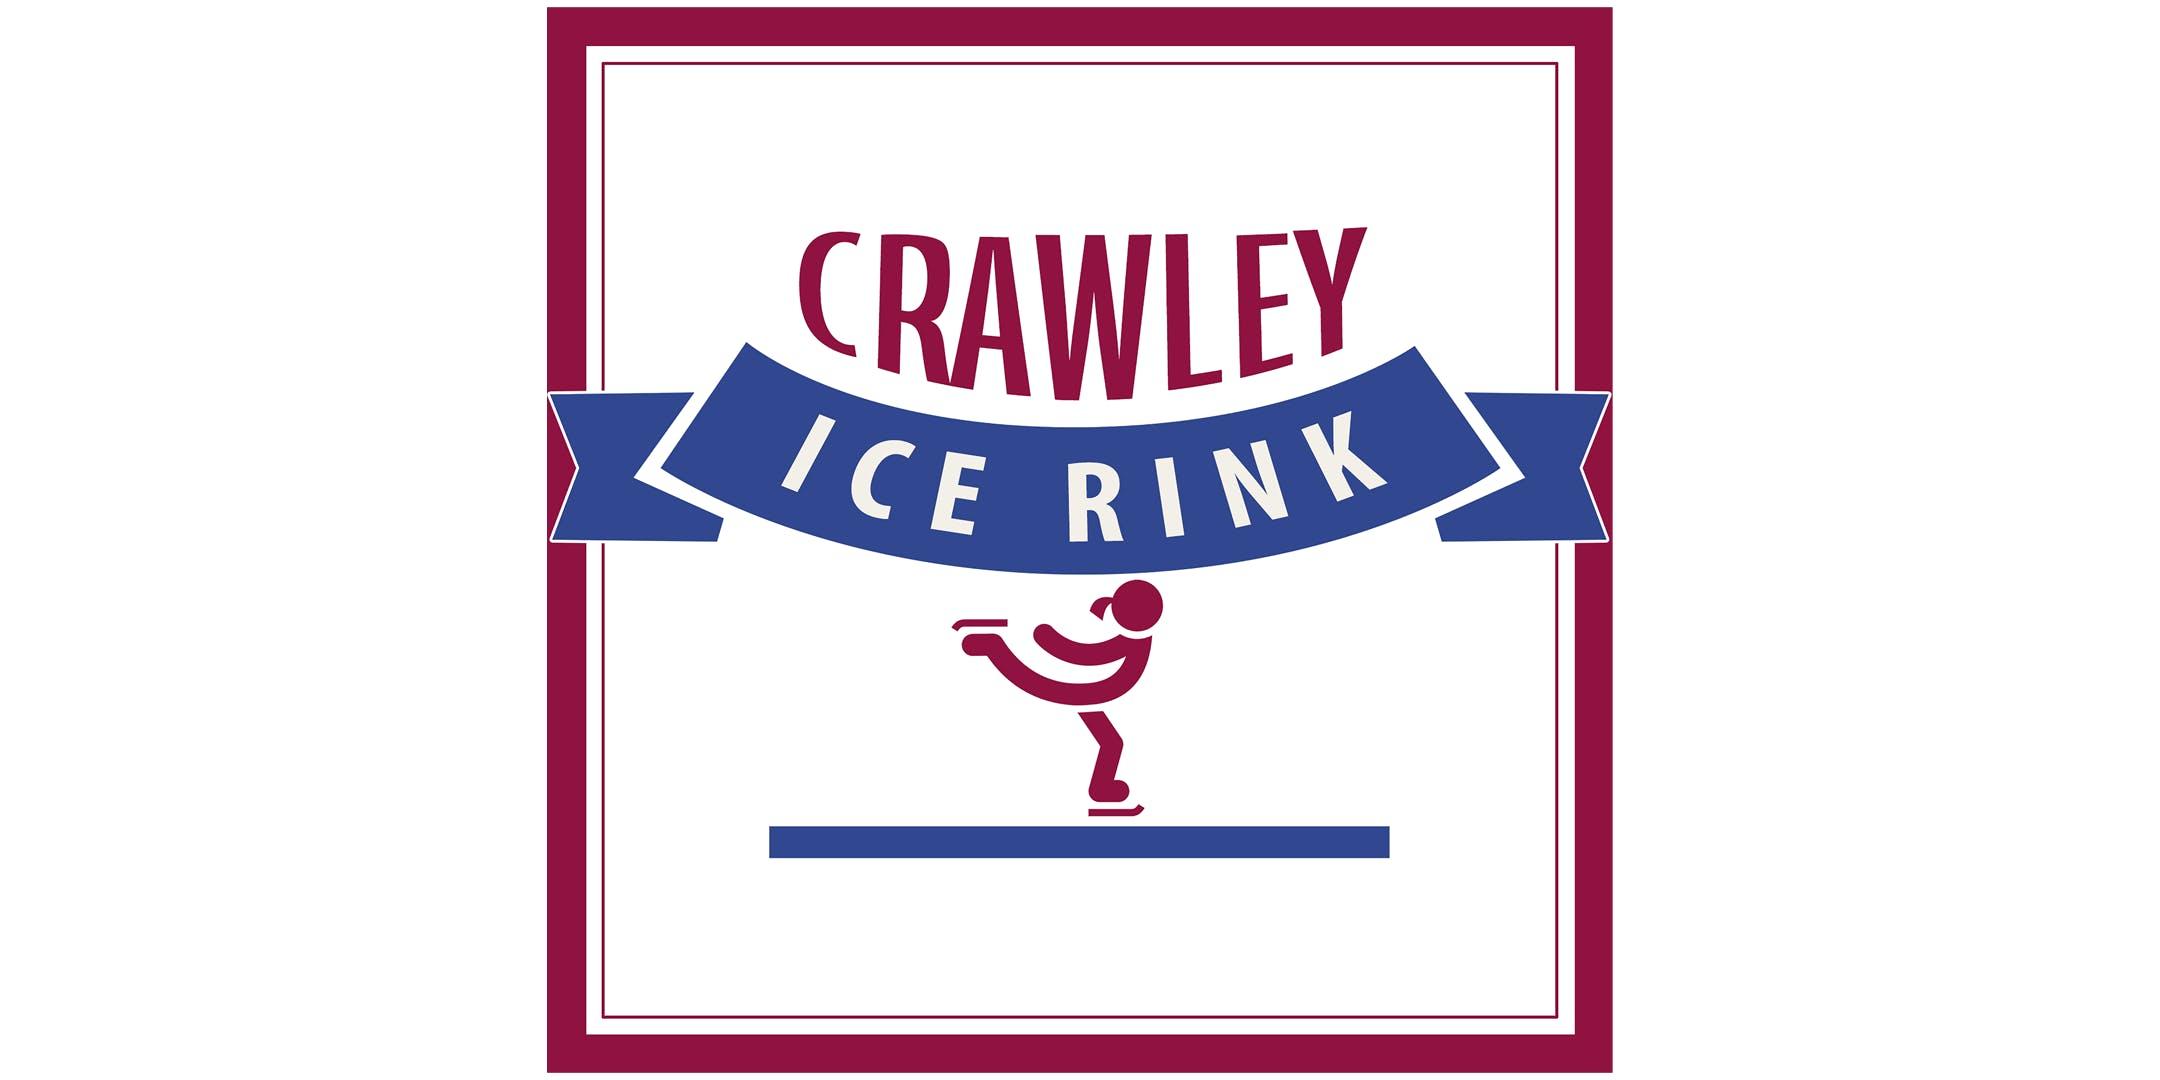 Crawley Ice Rink - November (Off Peak)